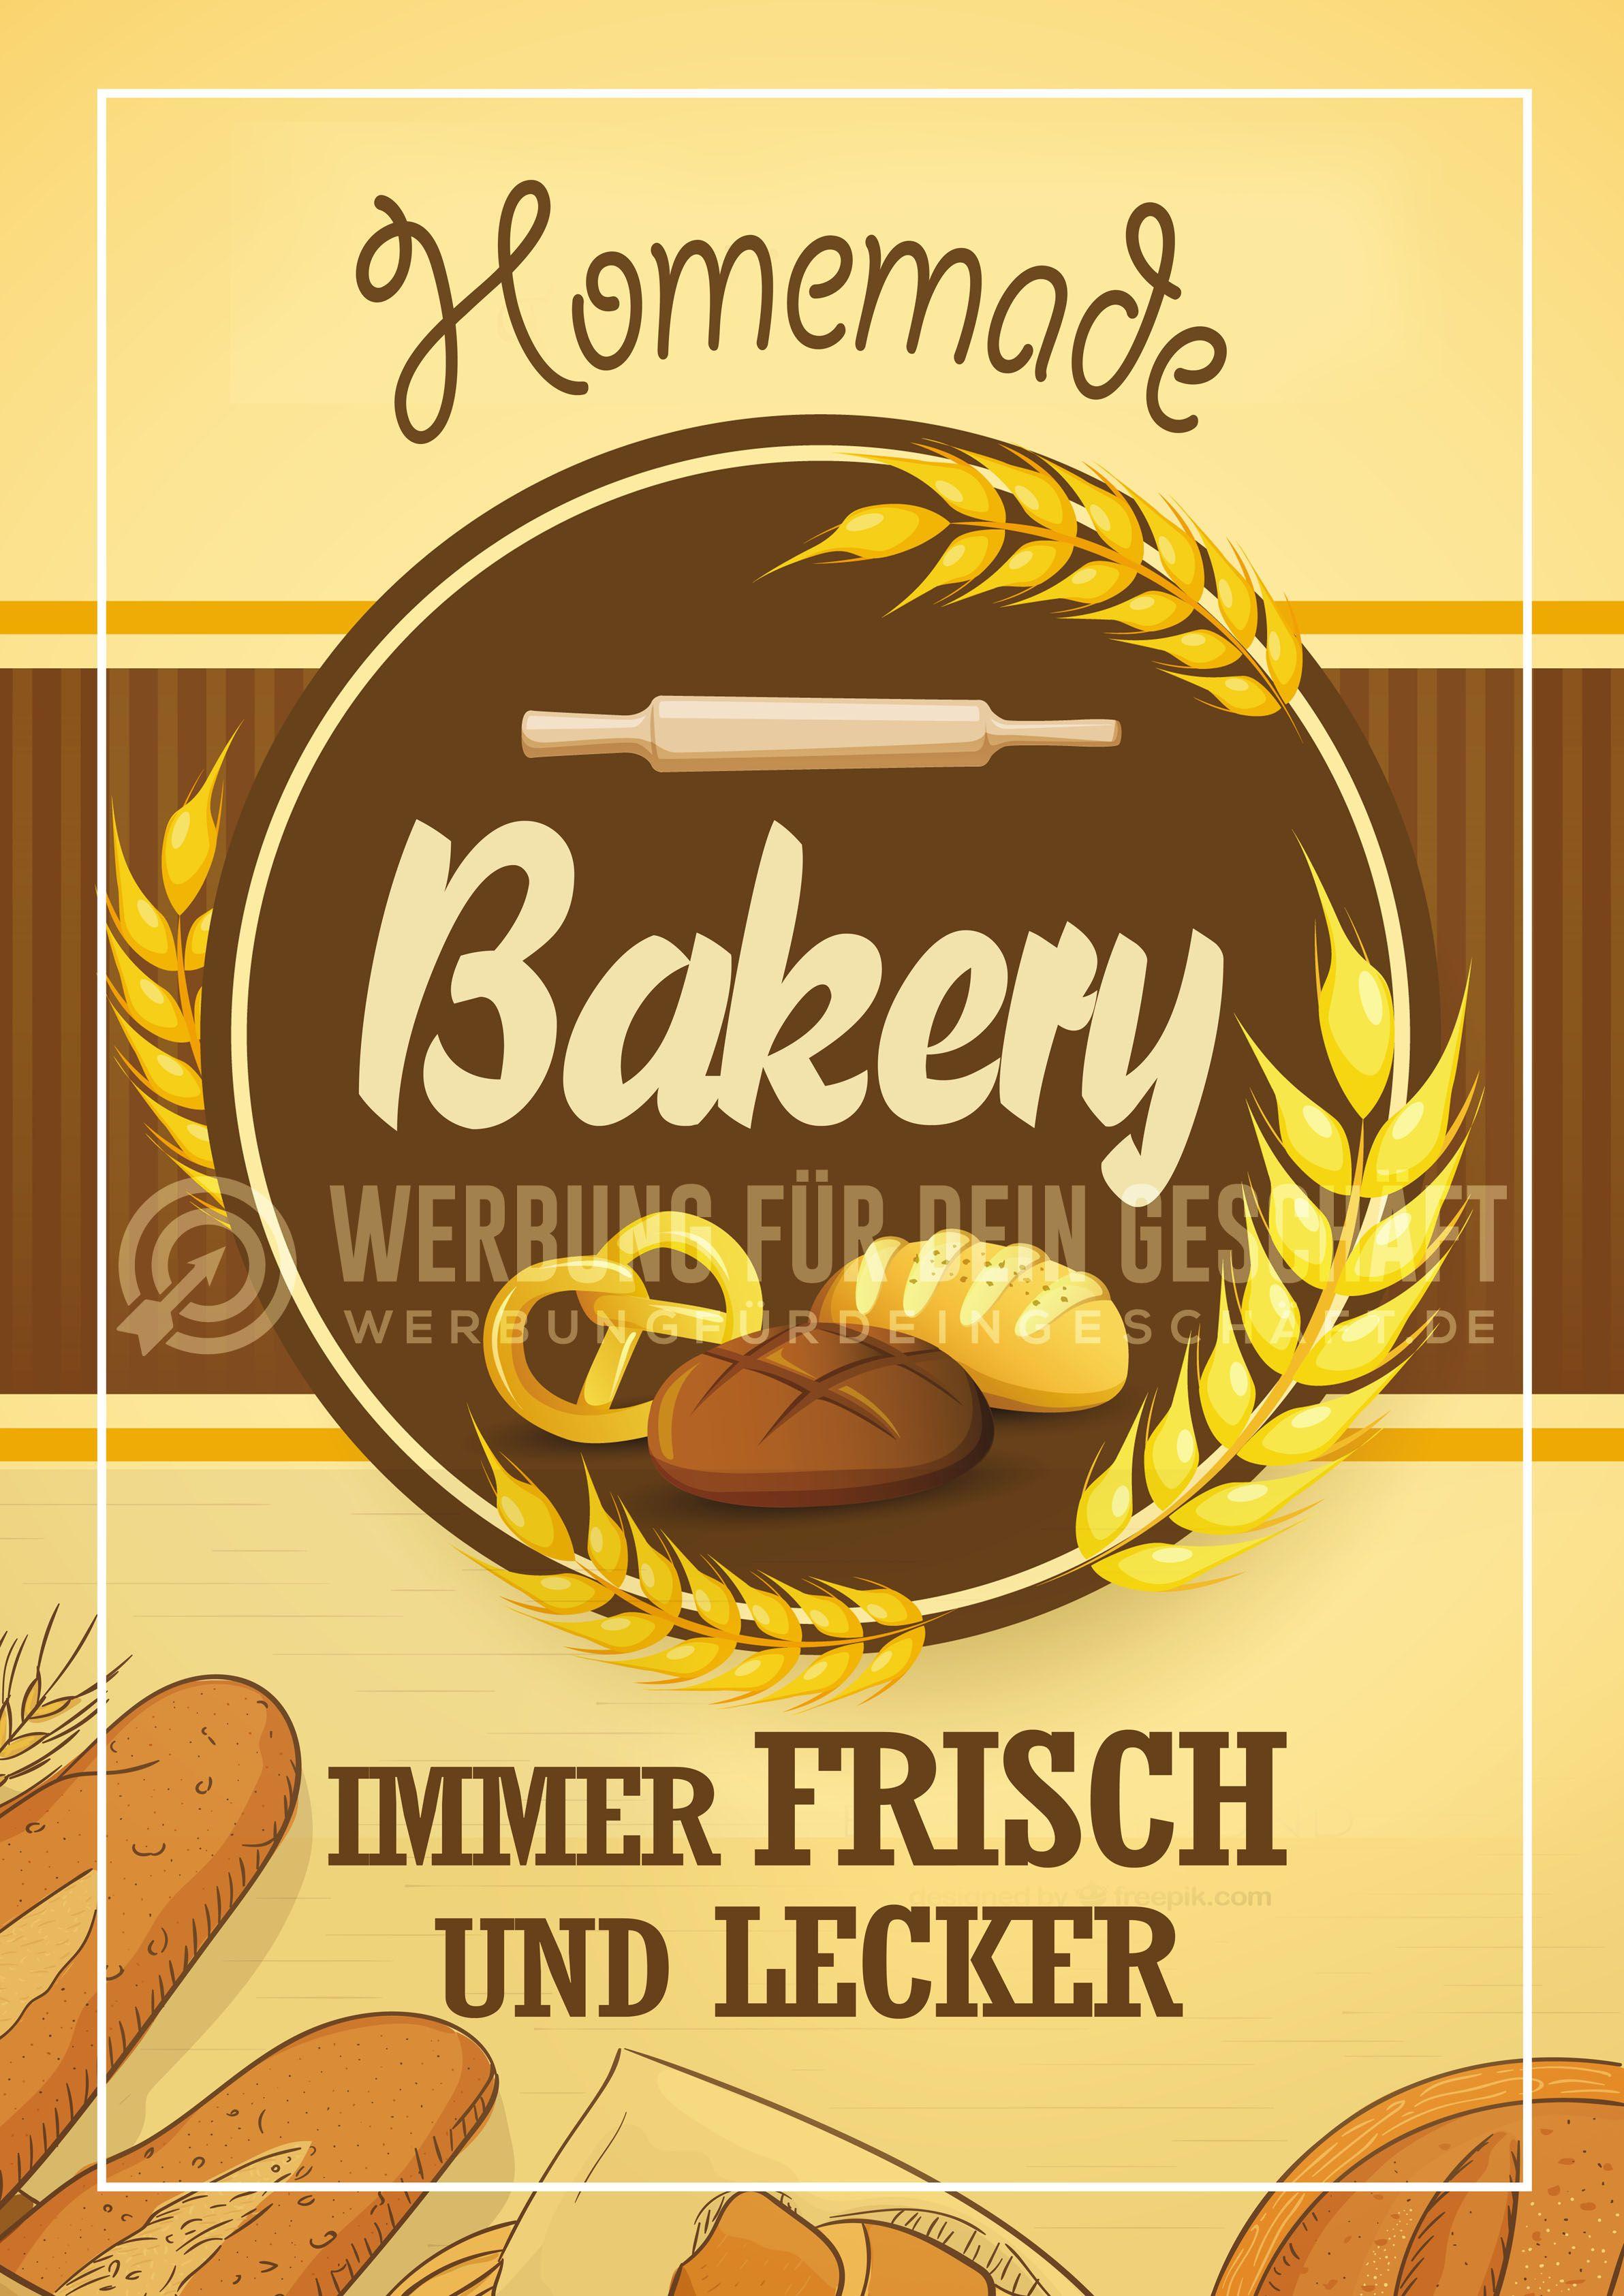 Dieses Poster Homemade Bakery Kann Fur Eure Werbung Eingesetzt Werden Backerei Poster Werbung Bakery Backerei Konditorei Backerei Konditorei